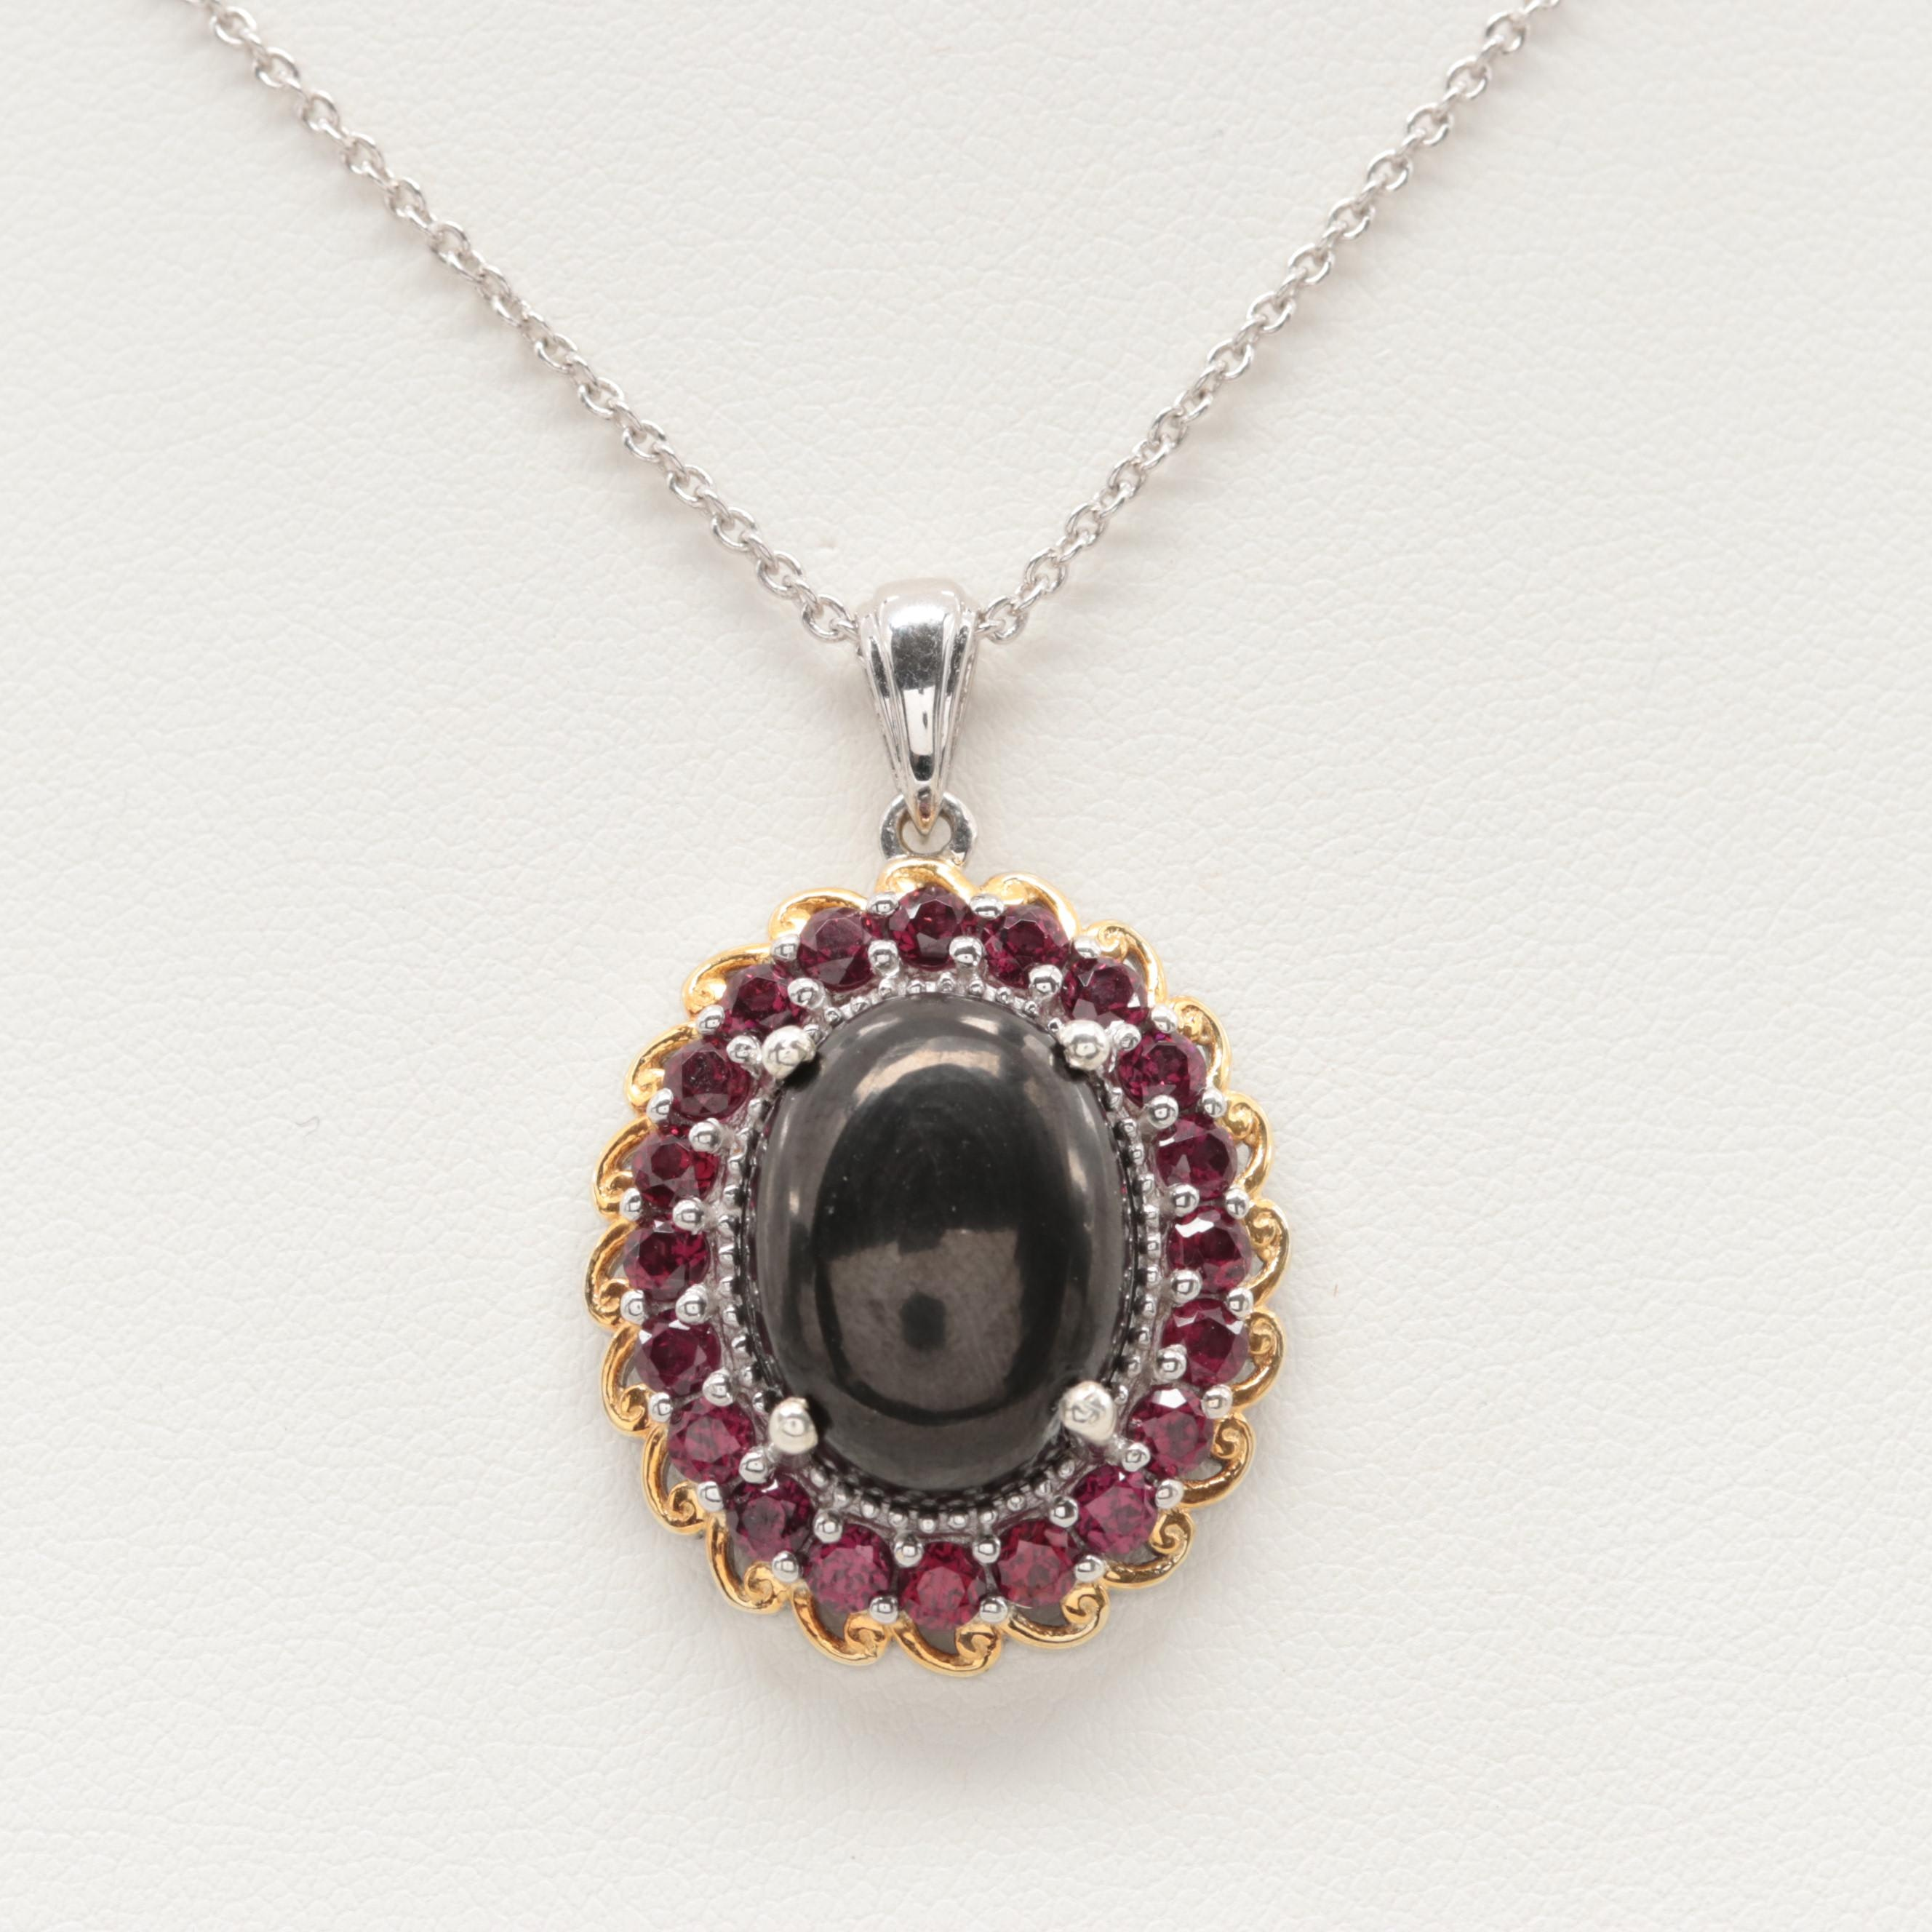 Sterling Silver Imitation Onyx and Rhodolite Garnet Pendant Necklace